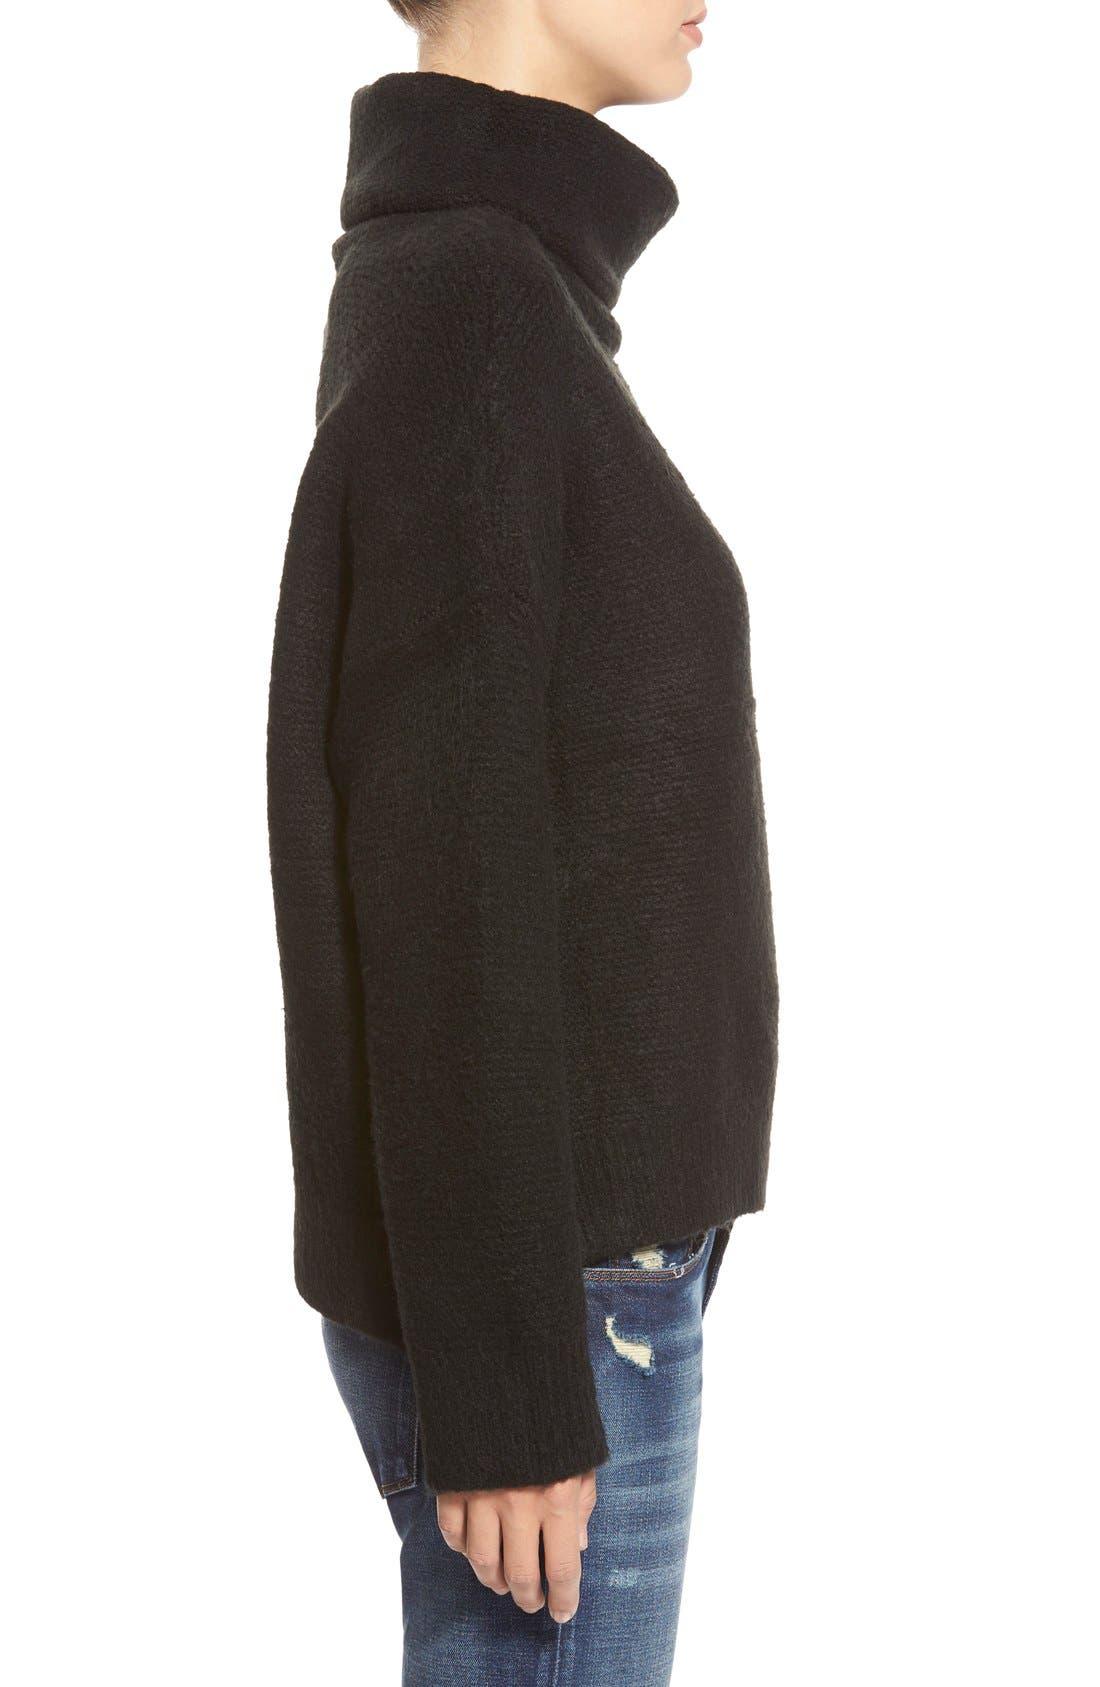 Boxy Turtleneck Sweater,                             Alternate thumbnail 2, color,                             001